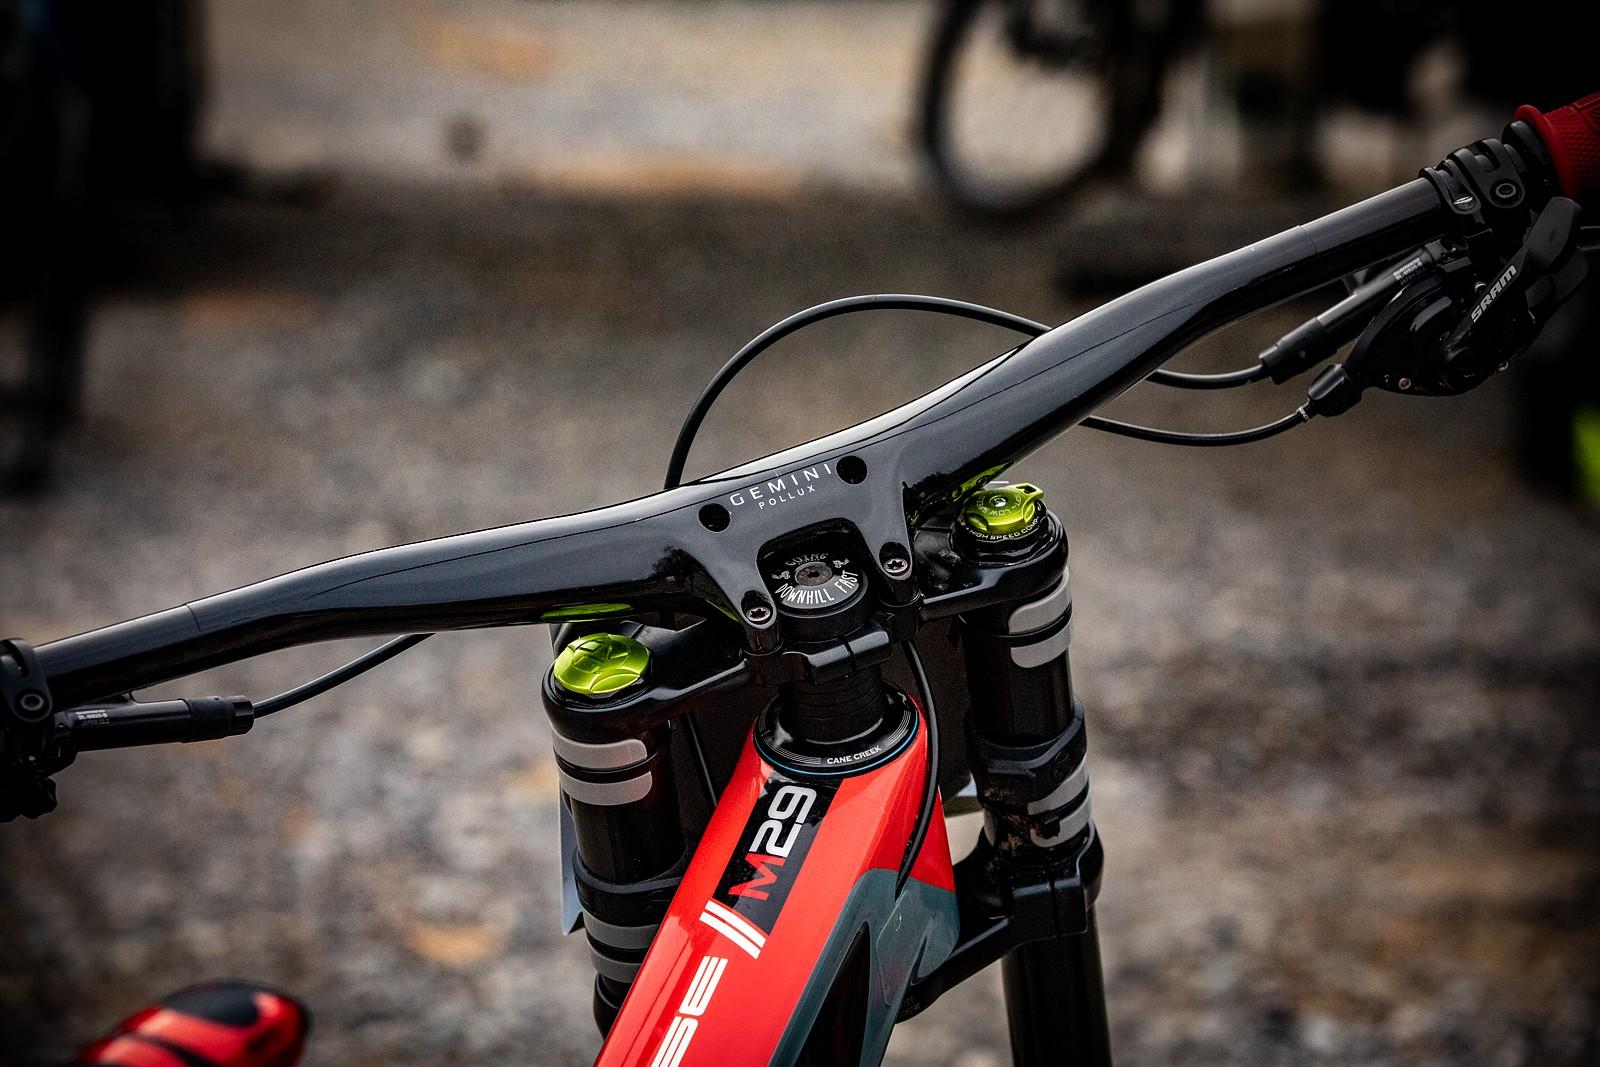 PIT BITS - Windrock U.S. National DH - Gemini Pollux Bar-Stem Combo - JackRice - Mountain Biking Pictures - Vital MTB